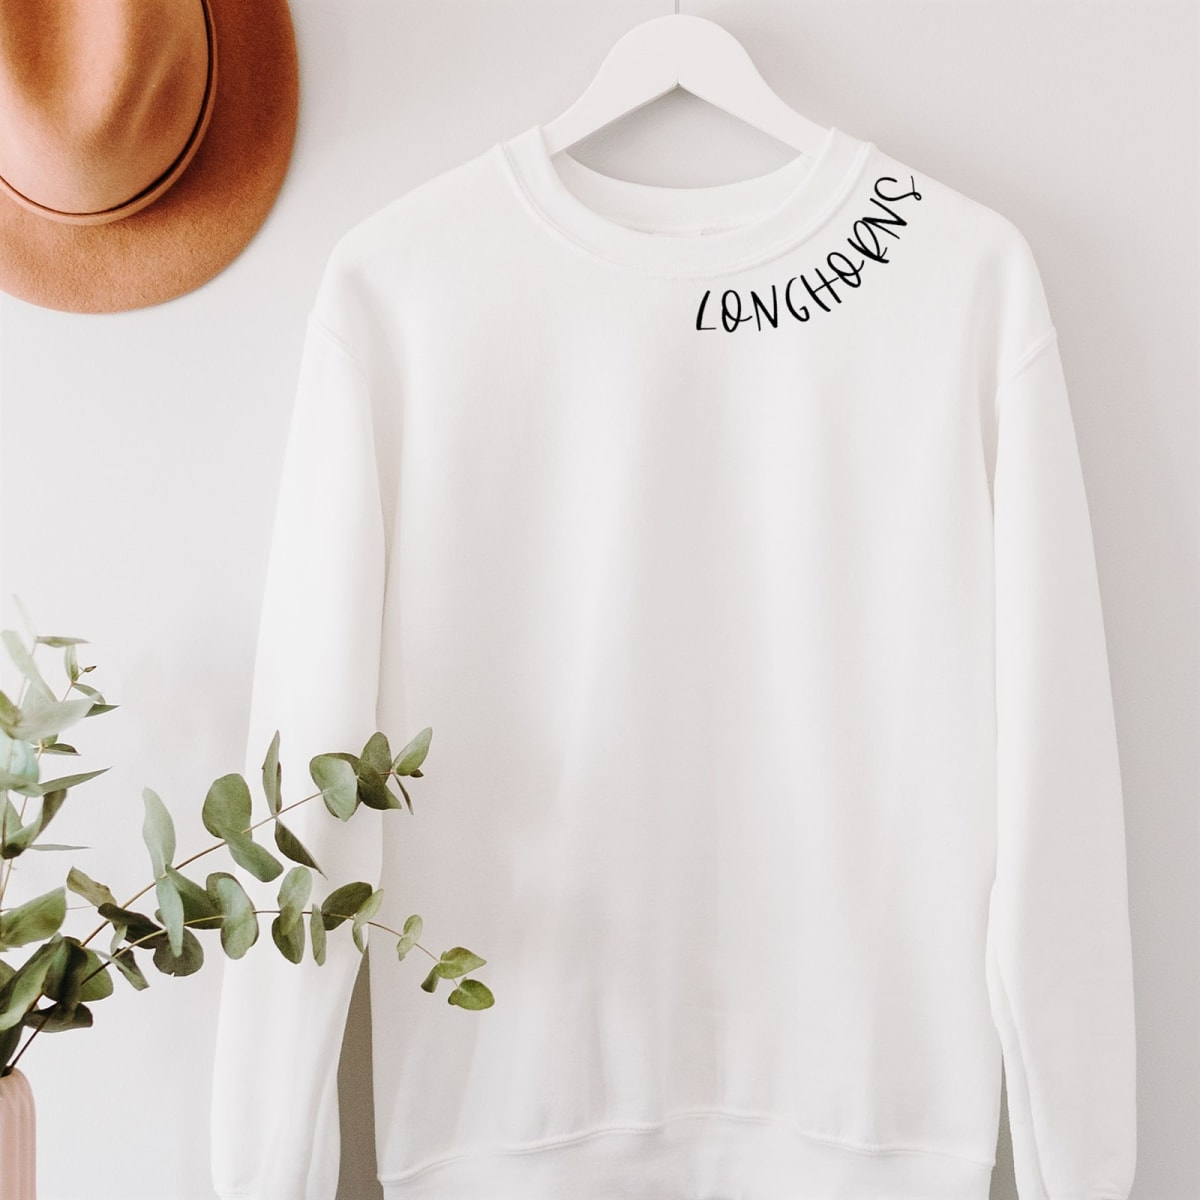 Custom Curve Fan Favorite Sweatshirt! .99 (REG .00) + Free Shipping at Jane!